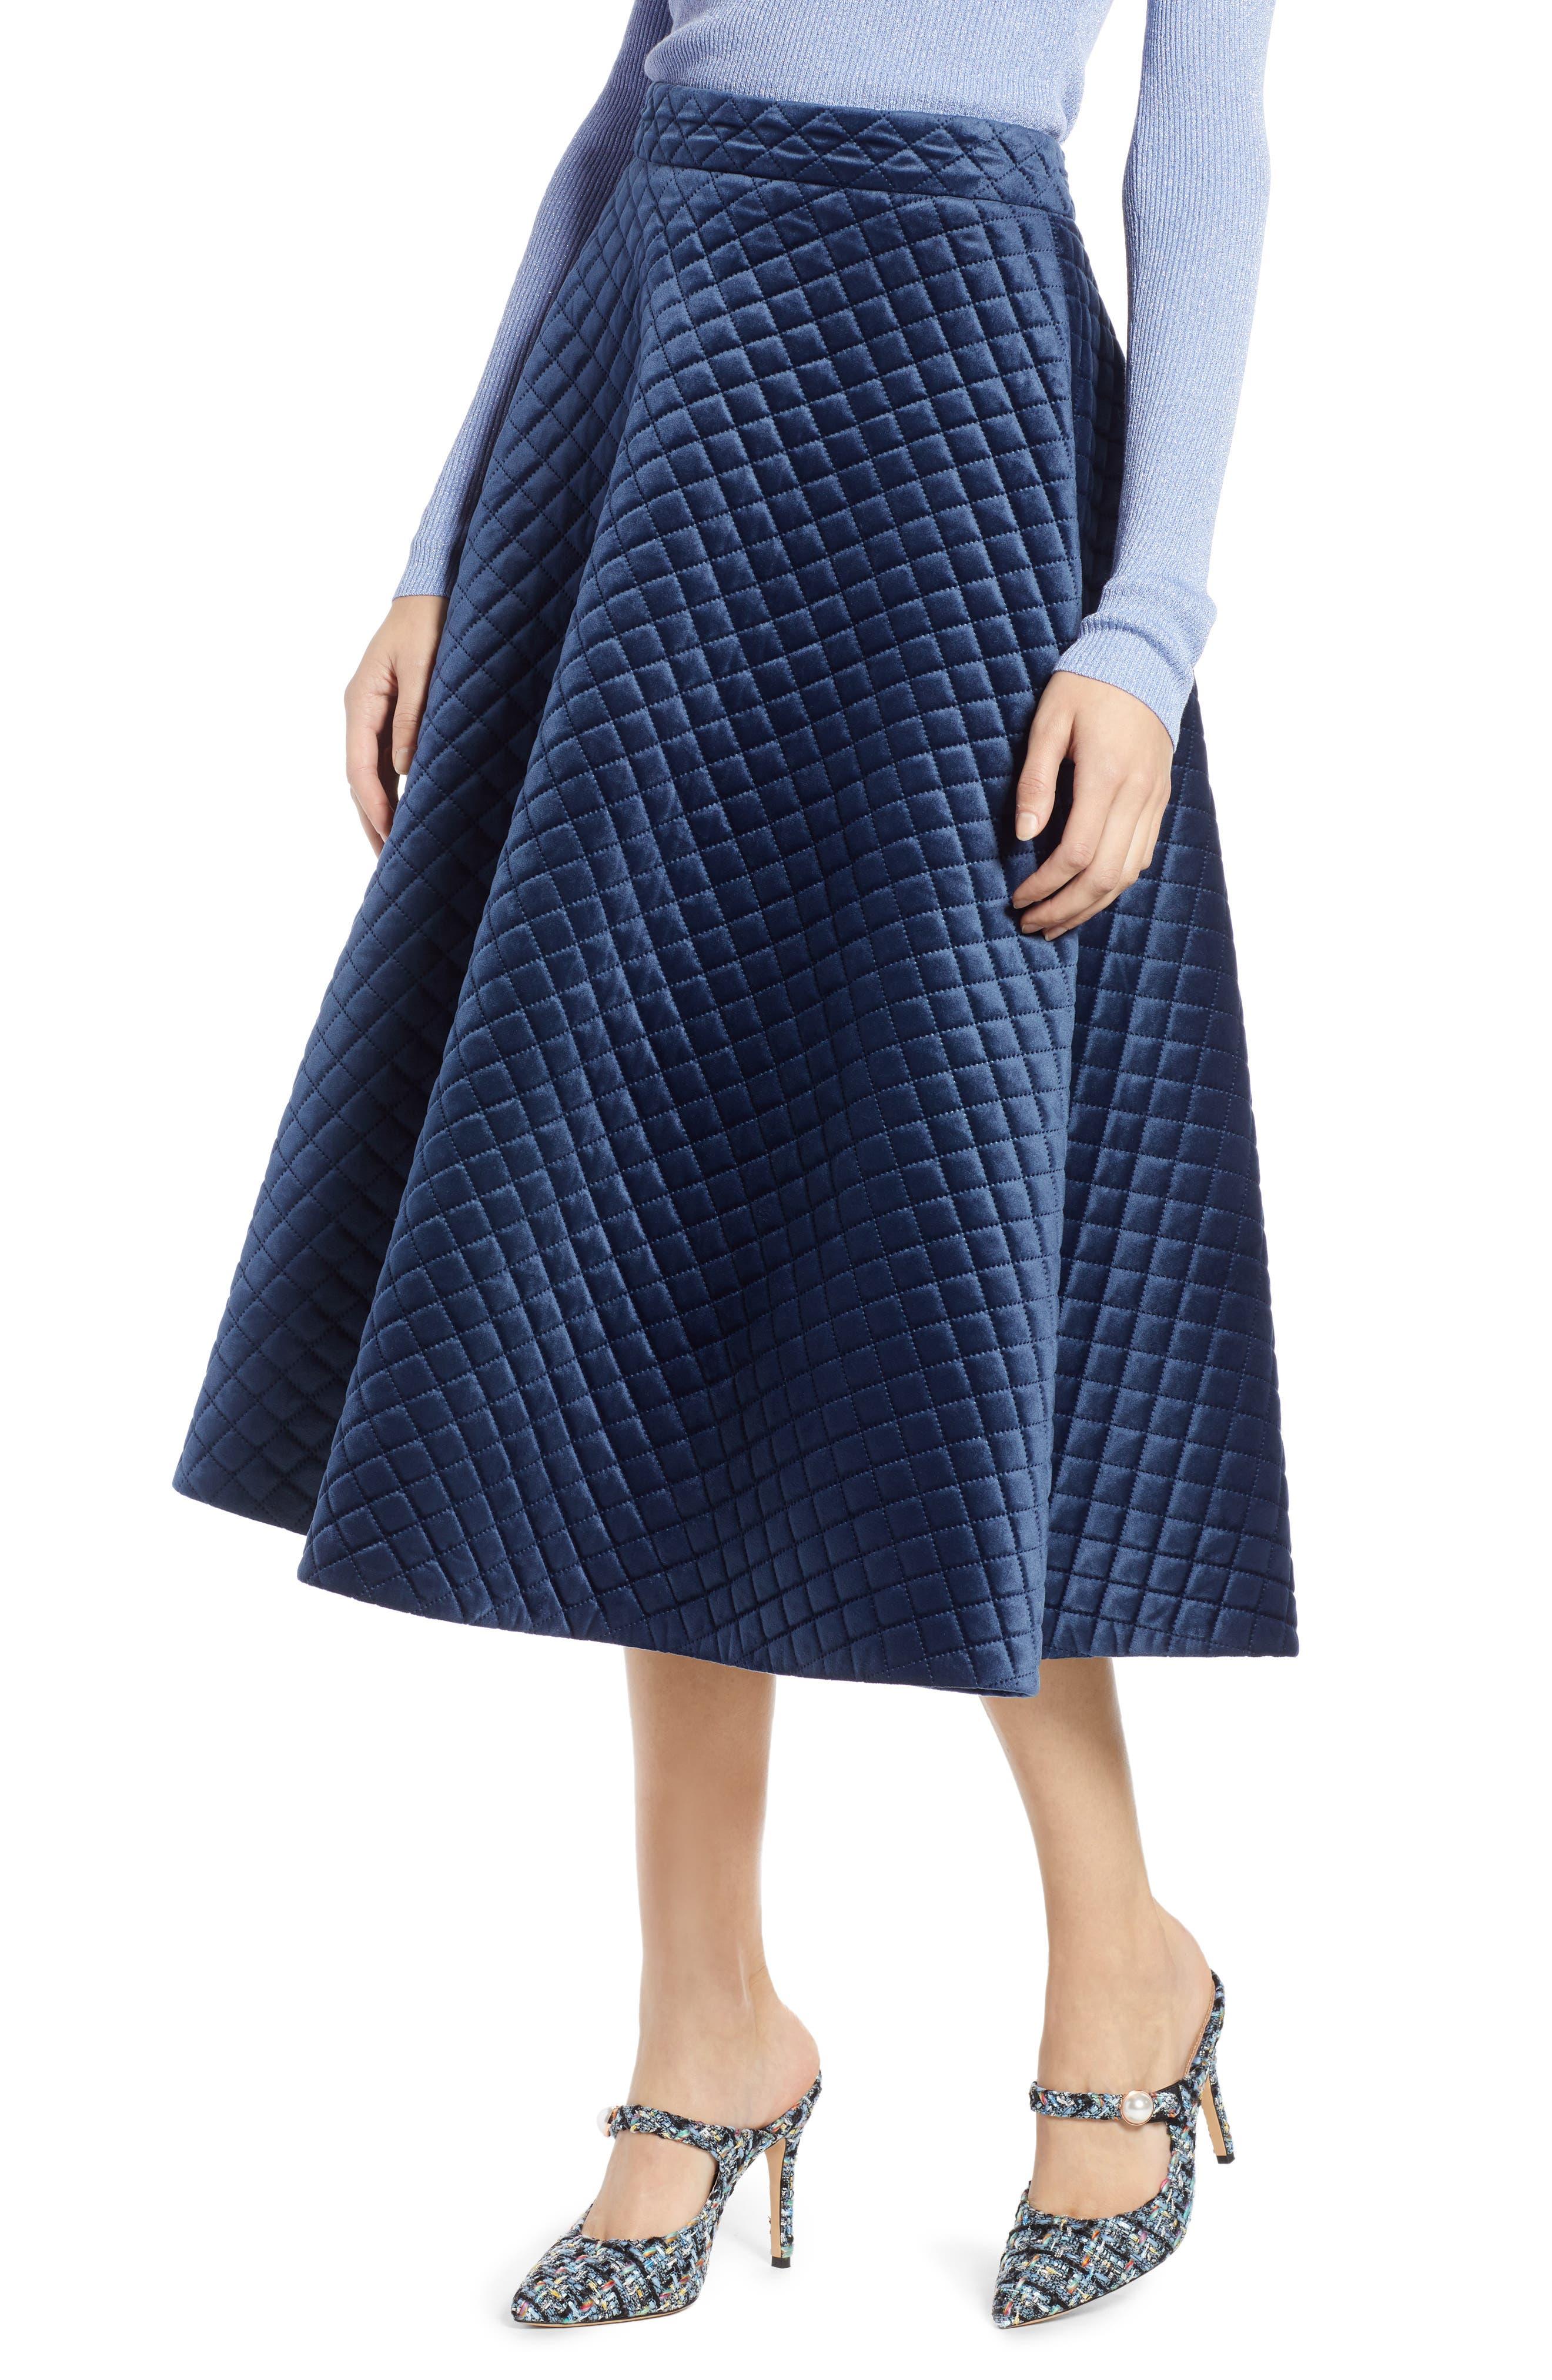 x Atlantic-Pacific Quilted Velour Circle Midi Skirt,                             Main thumbnail 1, color,                             NAVY BLAZER